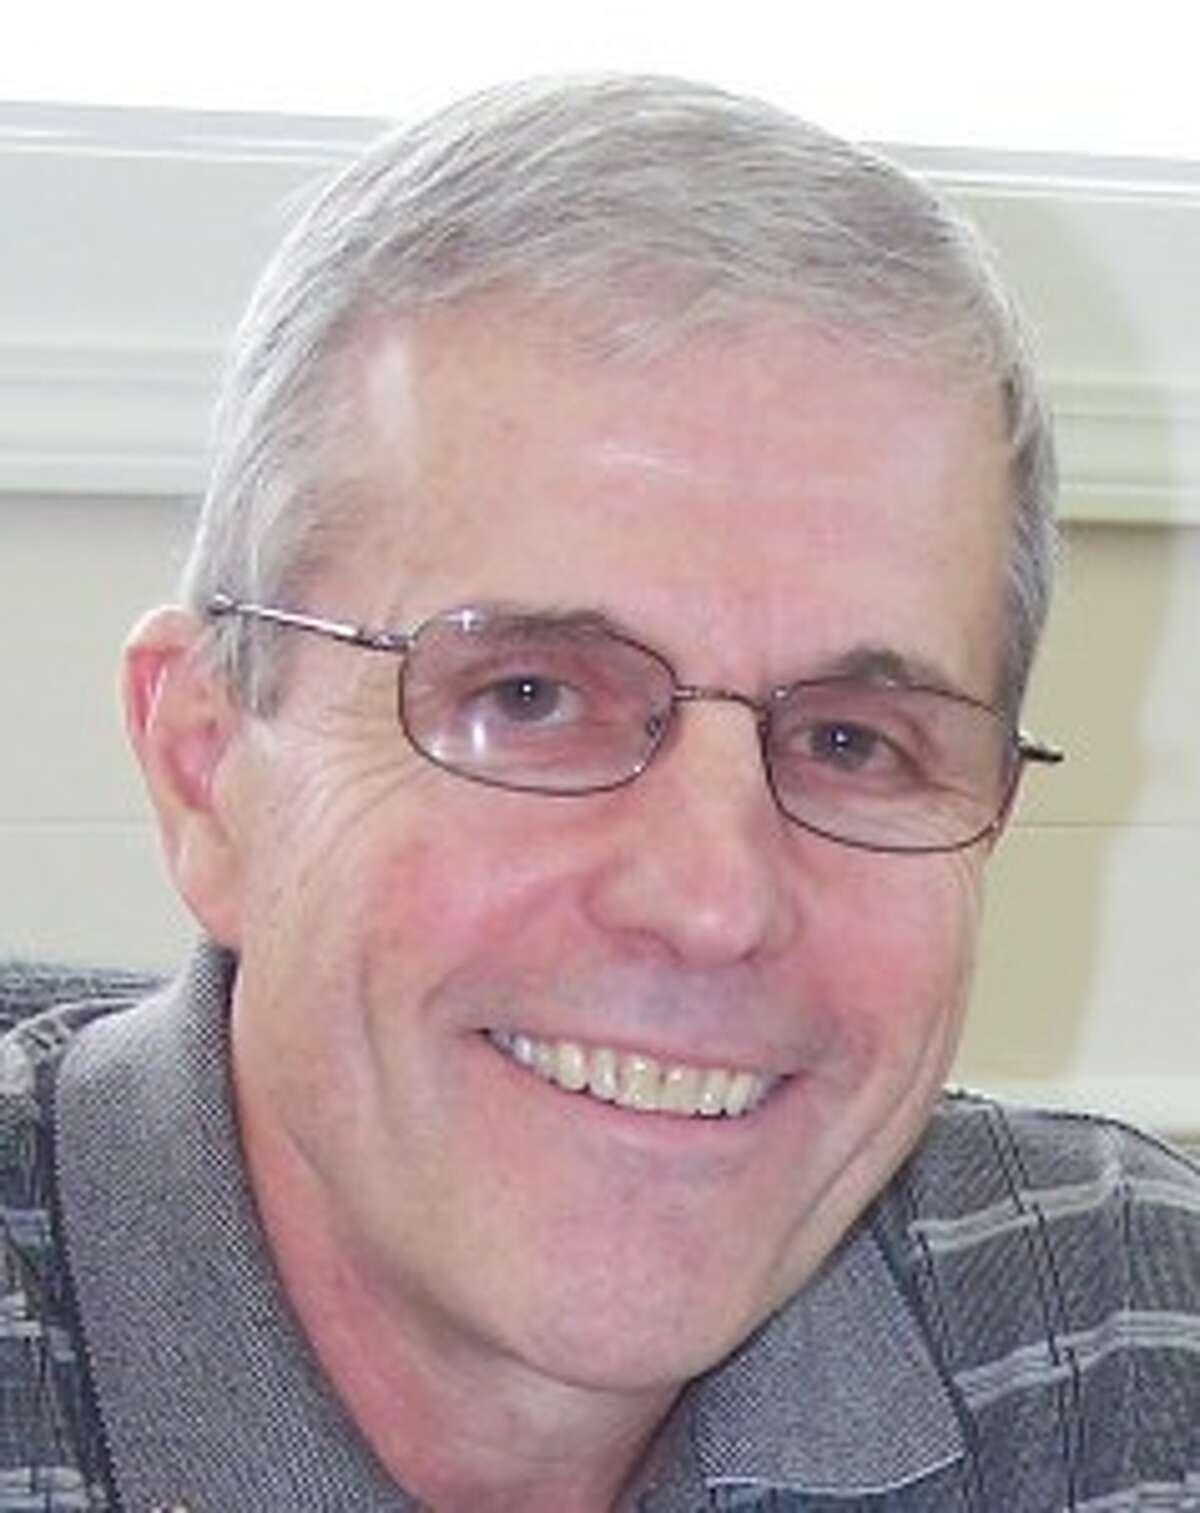 City Manager Ron Marek